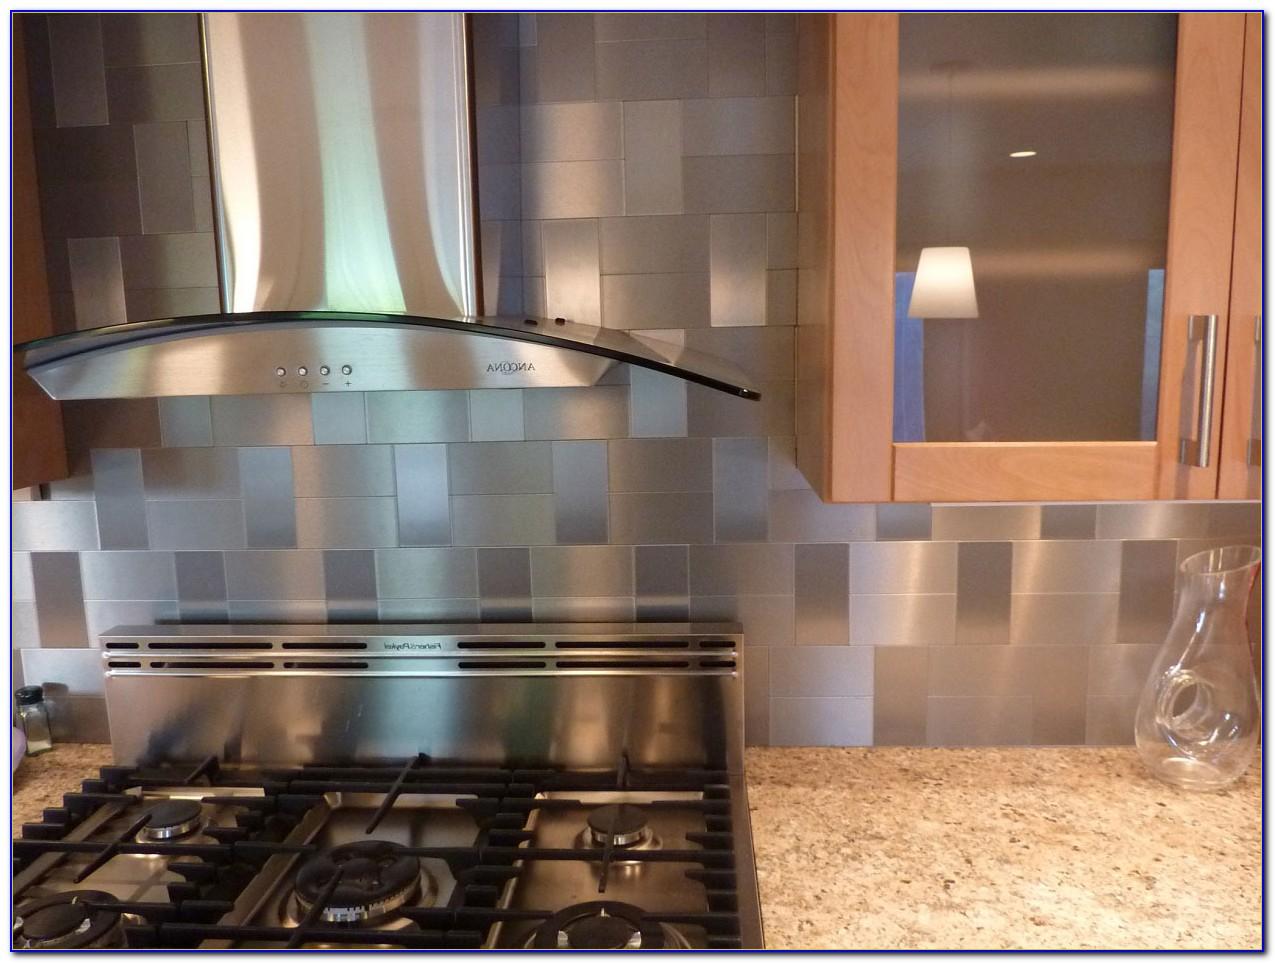 Stick On Metallic Tile Backsplash  Tiles  Home Design